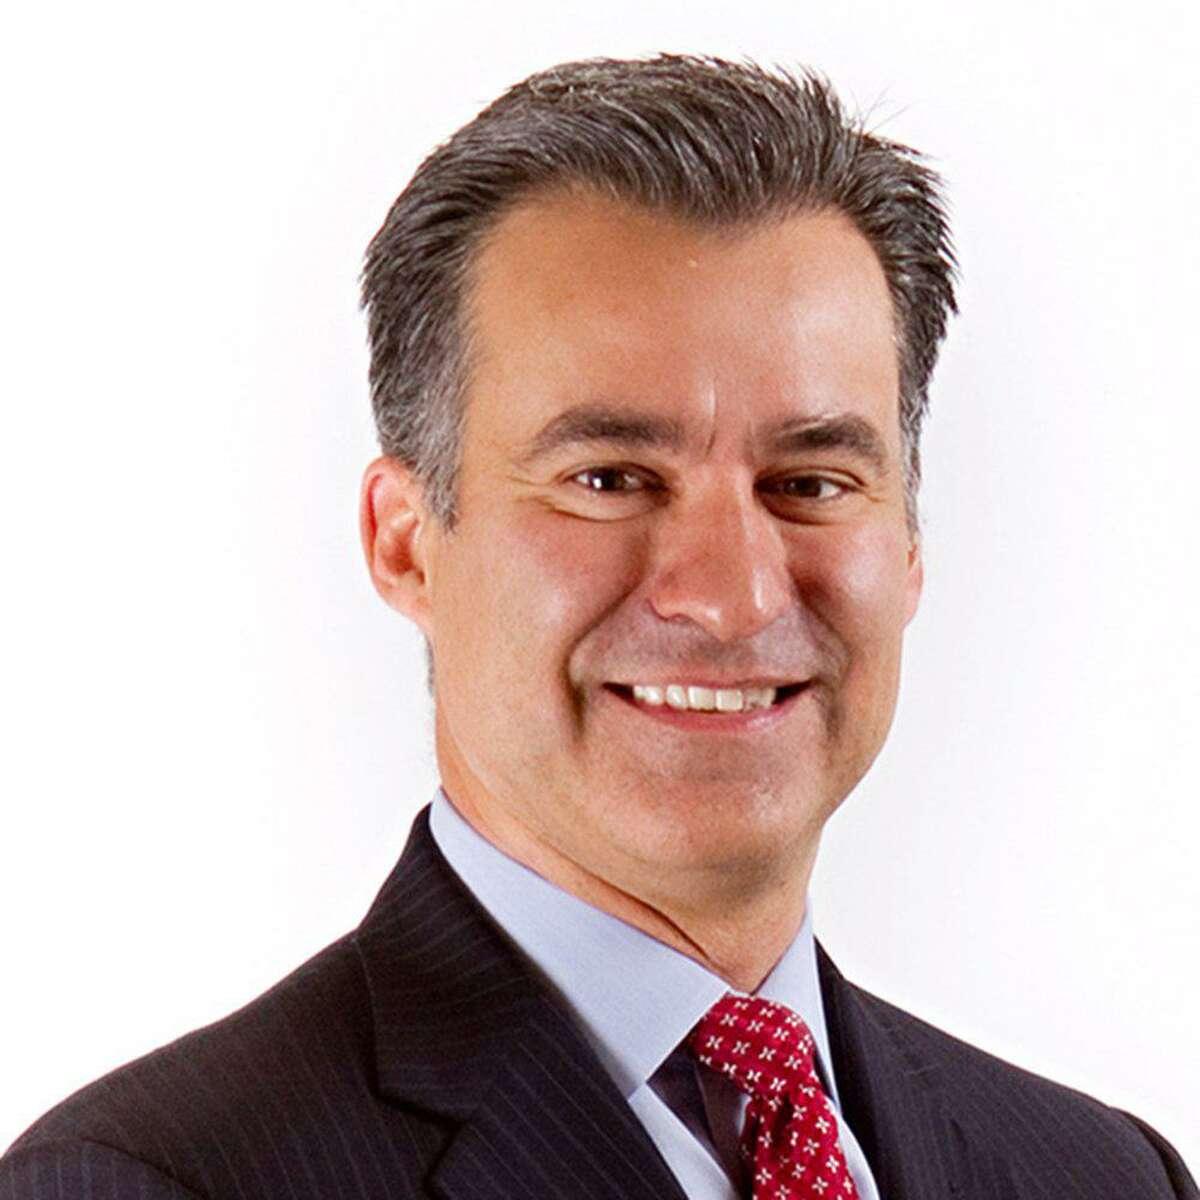 State Rep. Roland Gutierrez, D-San Antonio, is running in the 2020 Democratic primary for Senate District 19.